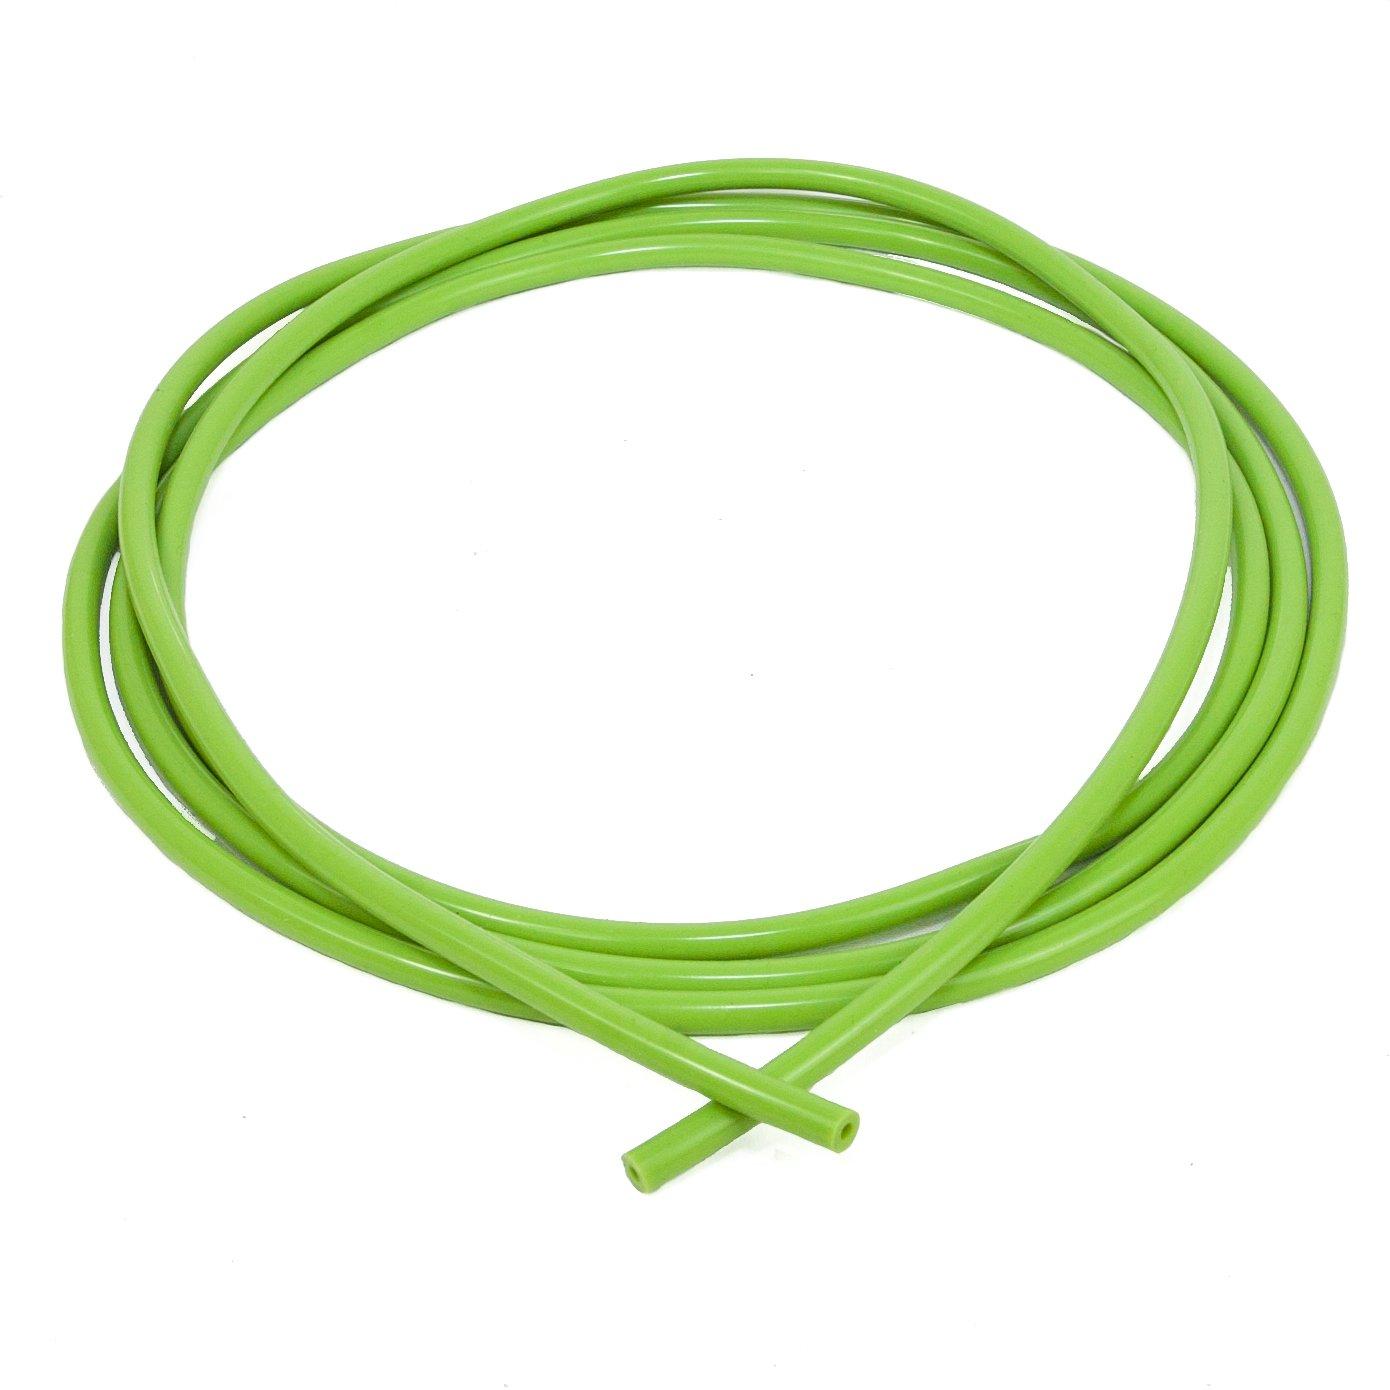 Ramair Filters vac3 mm-3 m-gr Manguera de vací o, de silicona, 3 mm x 3 m), color verde 3mm x 3m) Ramair Filters Ltd VAC3MM-3M-GR